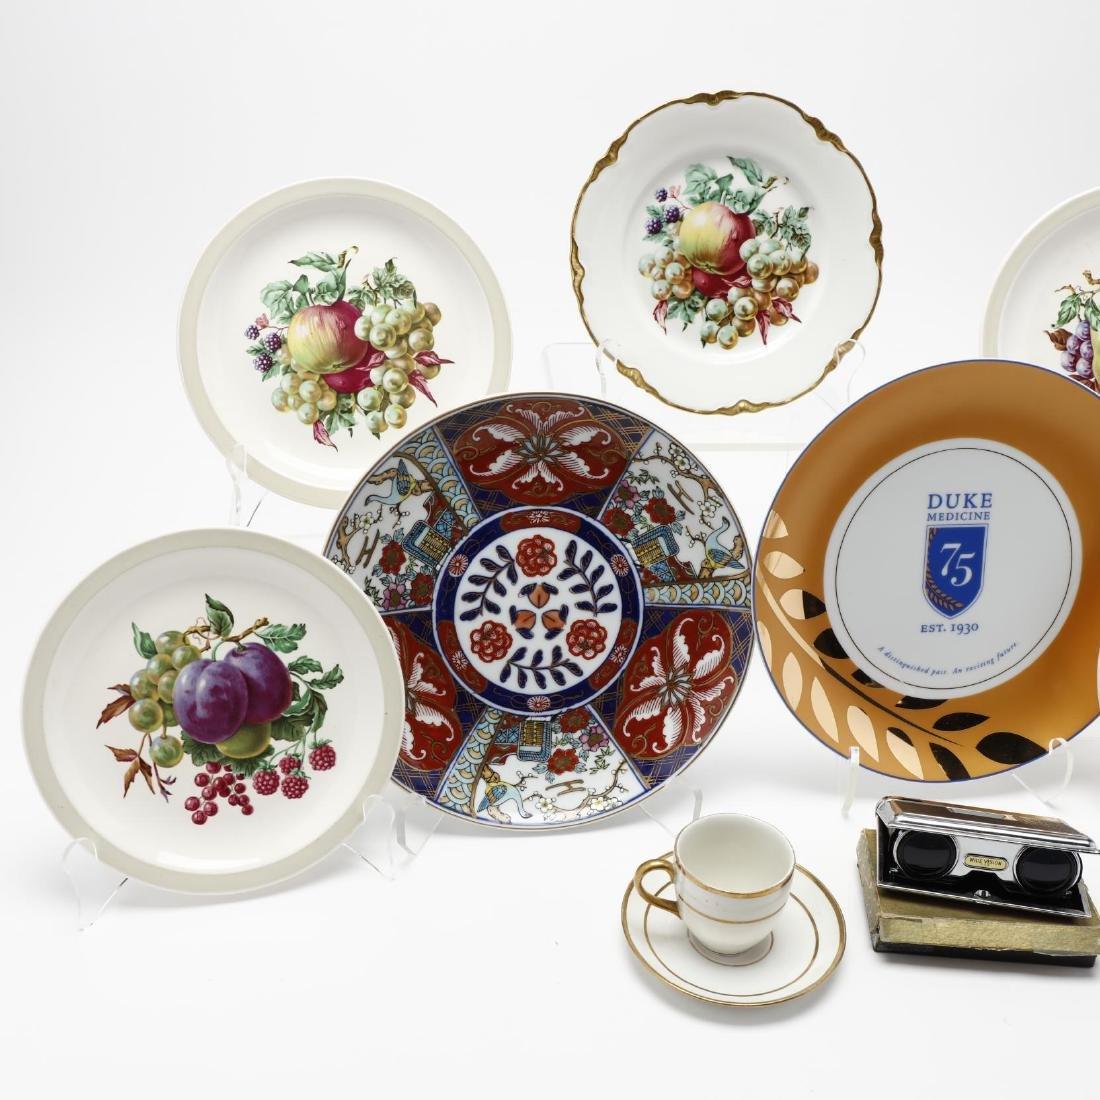 Assorted Vintage Porcelain and Opera Glasses - 2